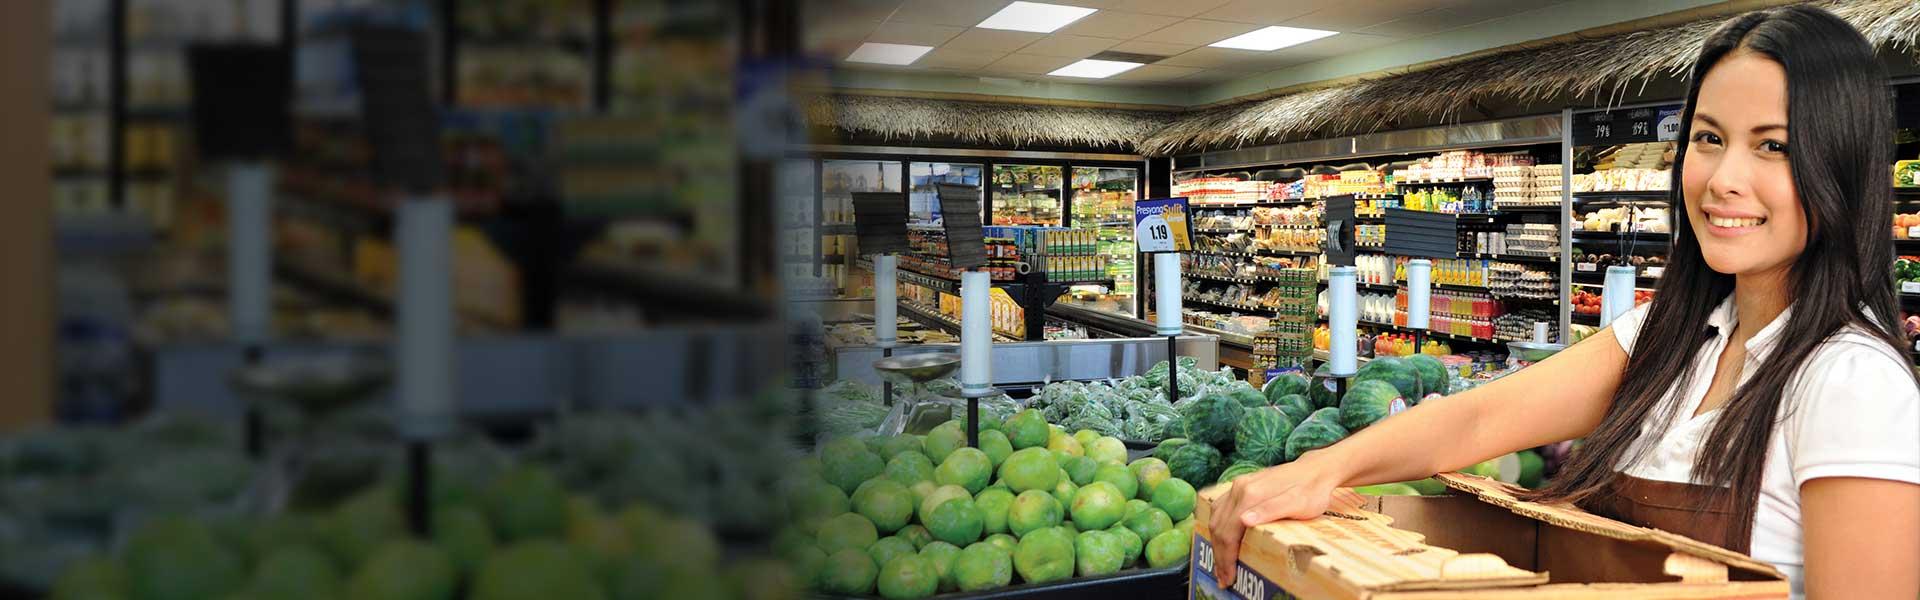 Island Pacific Supermarket Long Beach